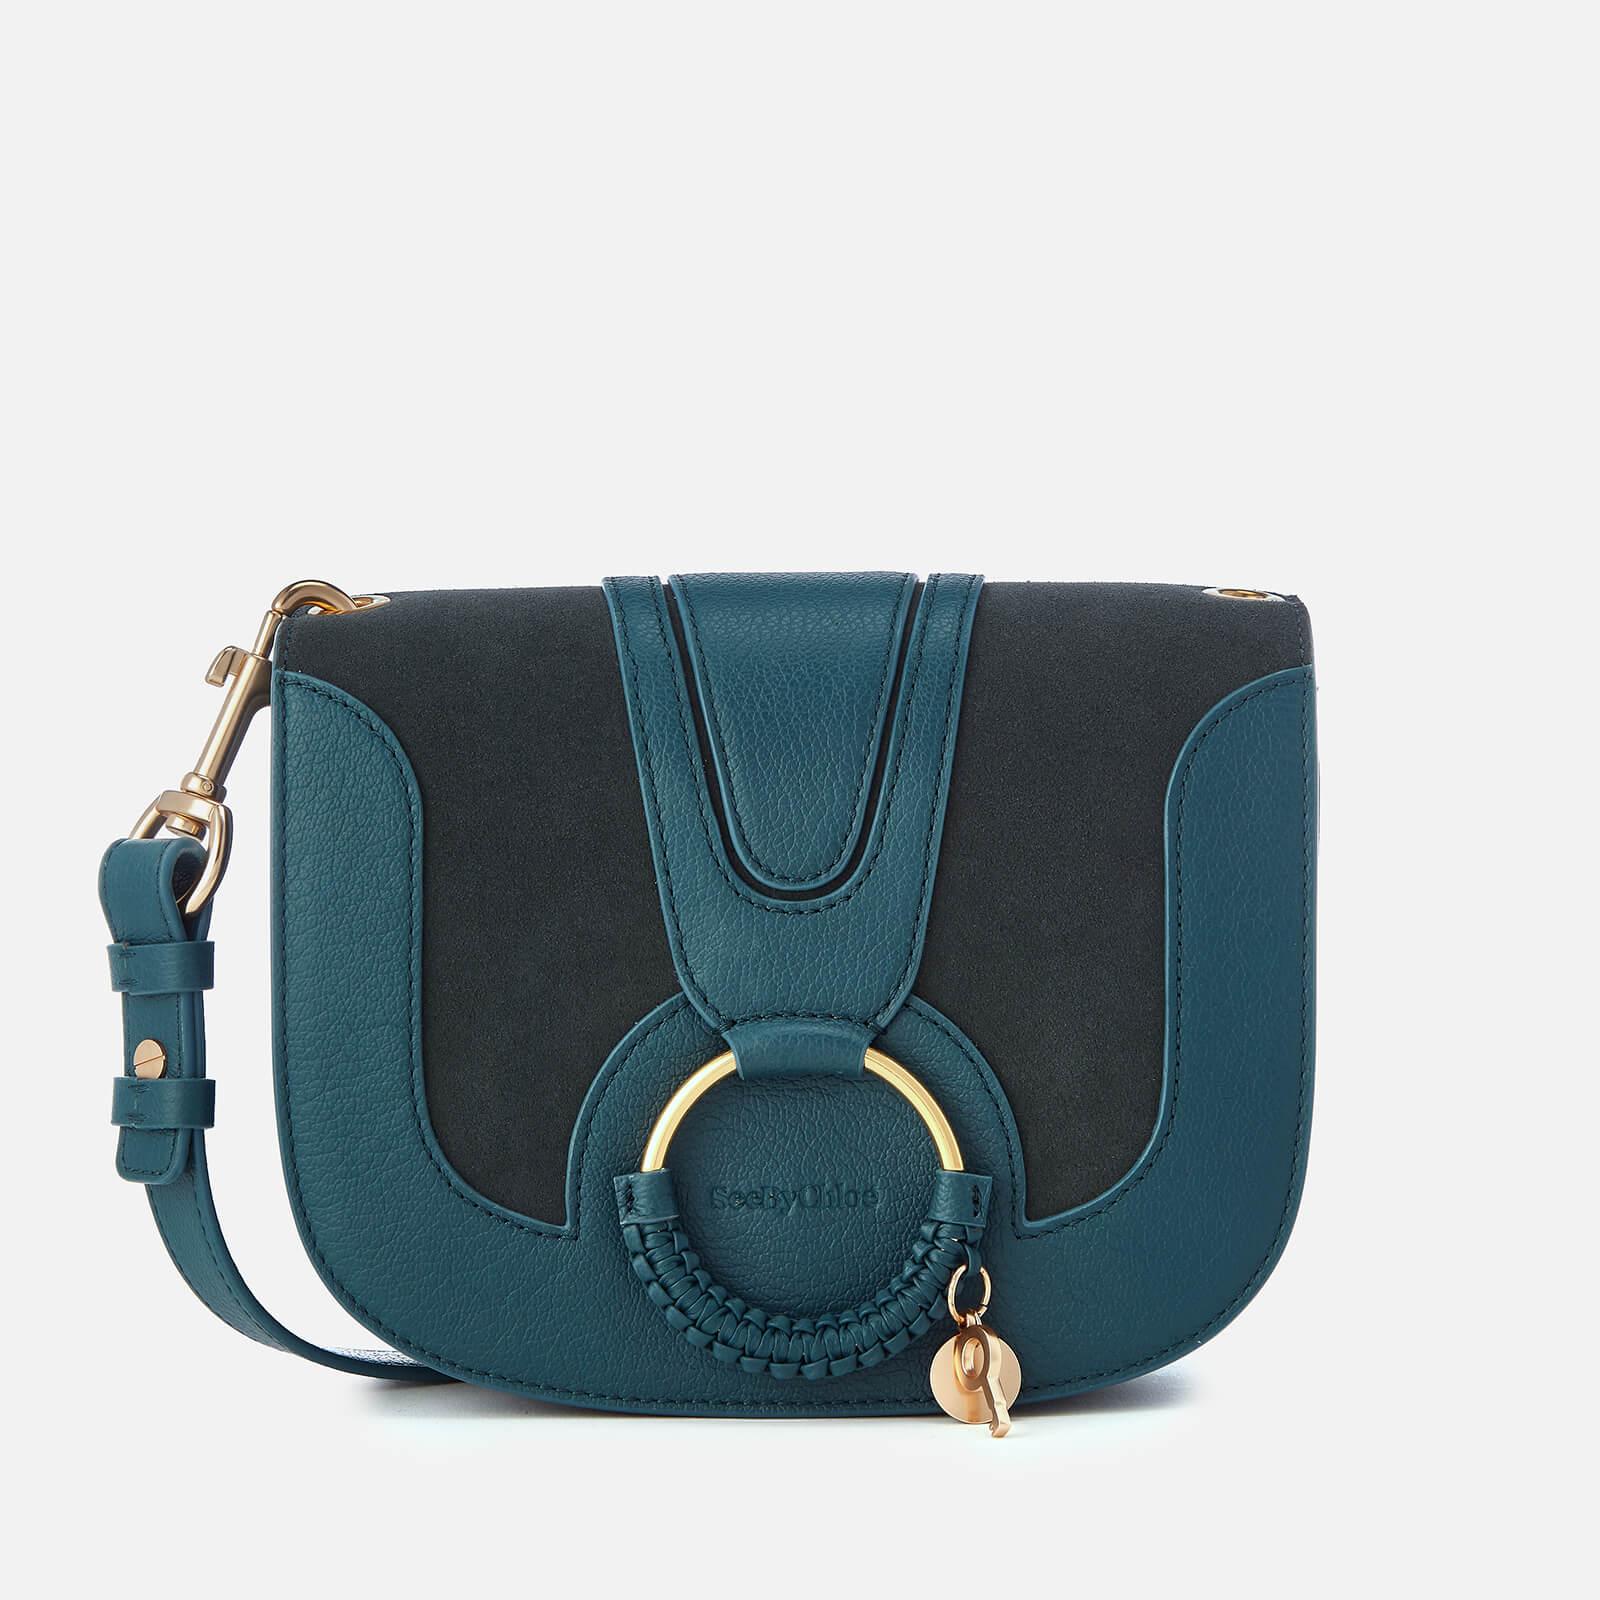 9d8b948e5e See By Chloé Women's Hana Leather Cross Body Bag - Steel Blue